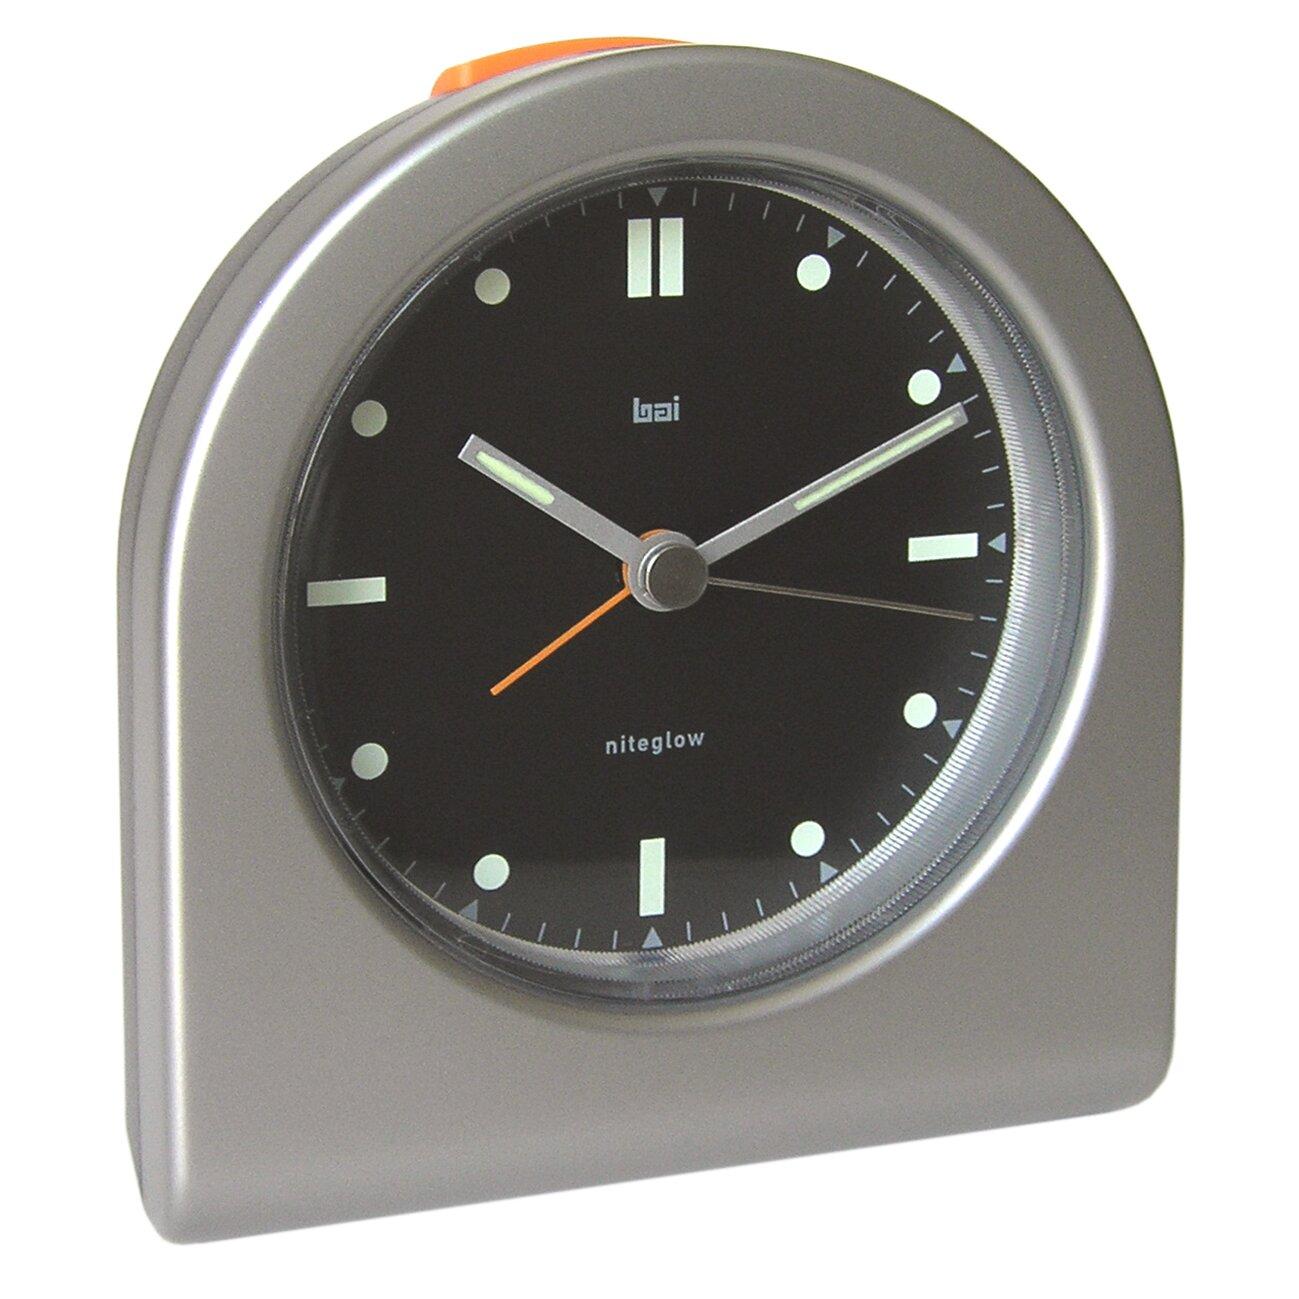 Bai design logic designer alarm clock reviews wayfair for Designer alarm clock